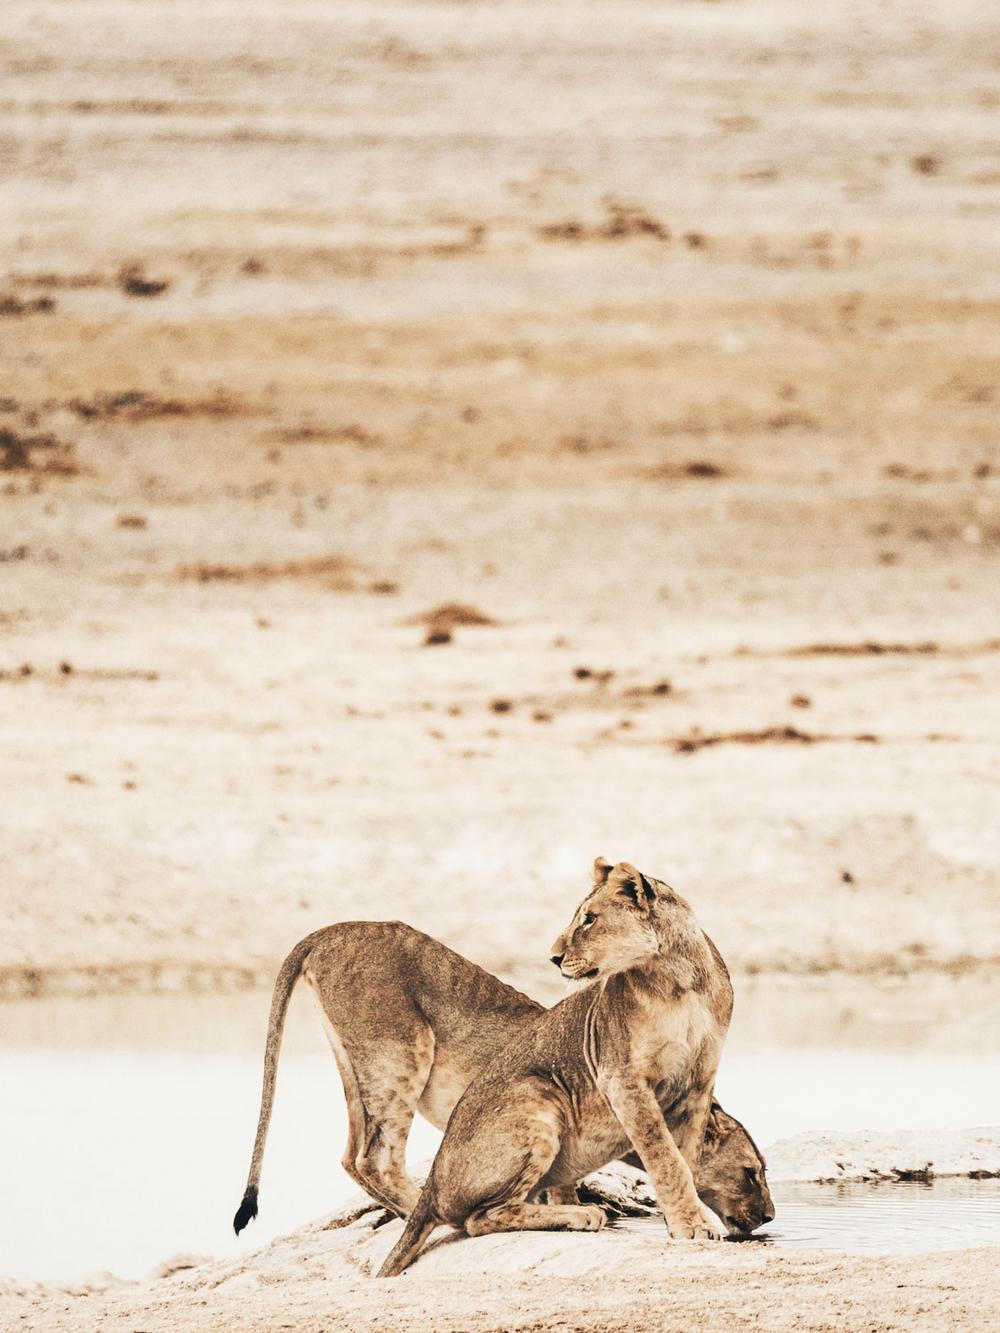 CallieGiovanna_Africa_Namibia_EtoshaNationalPark_20150101_01741.jpg